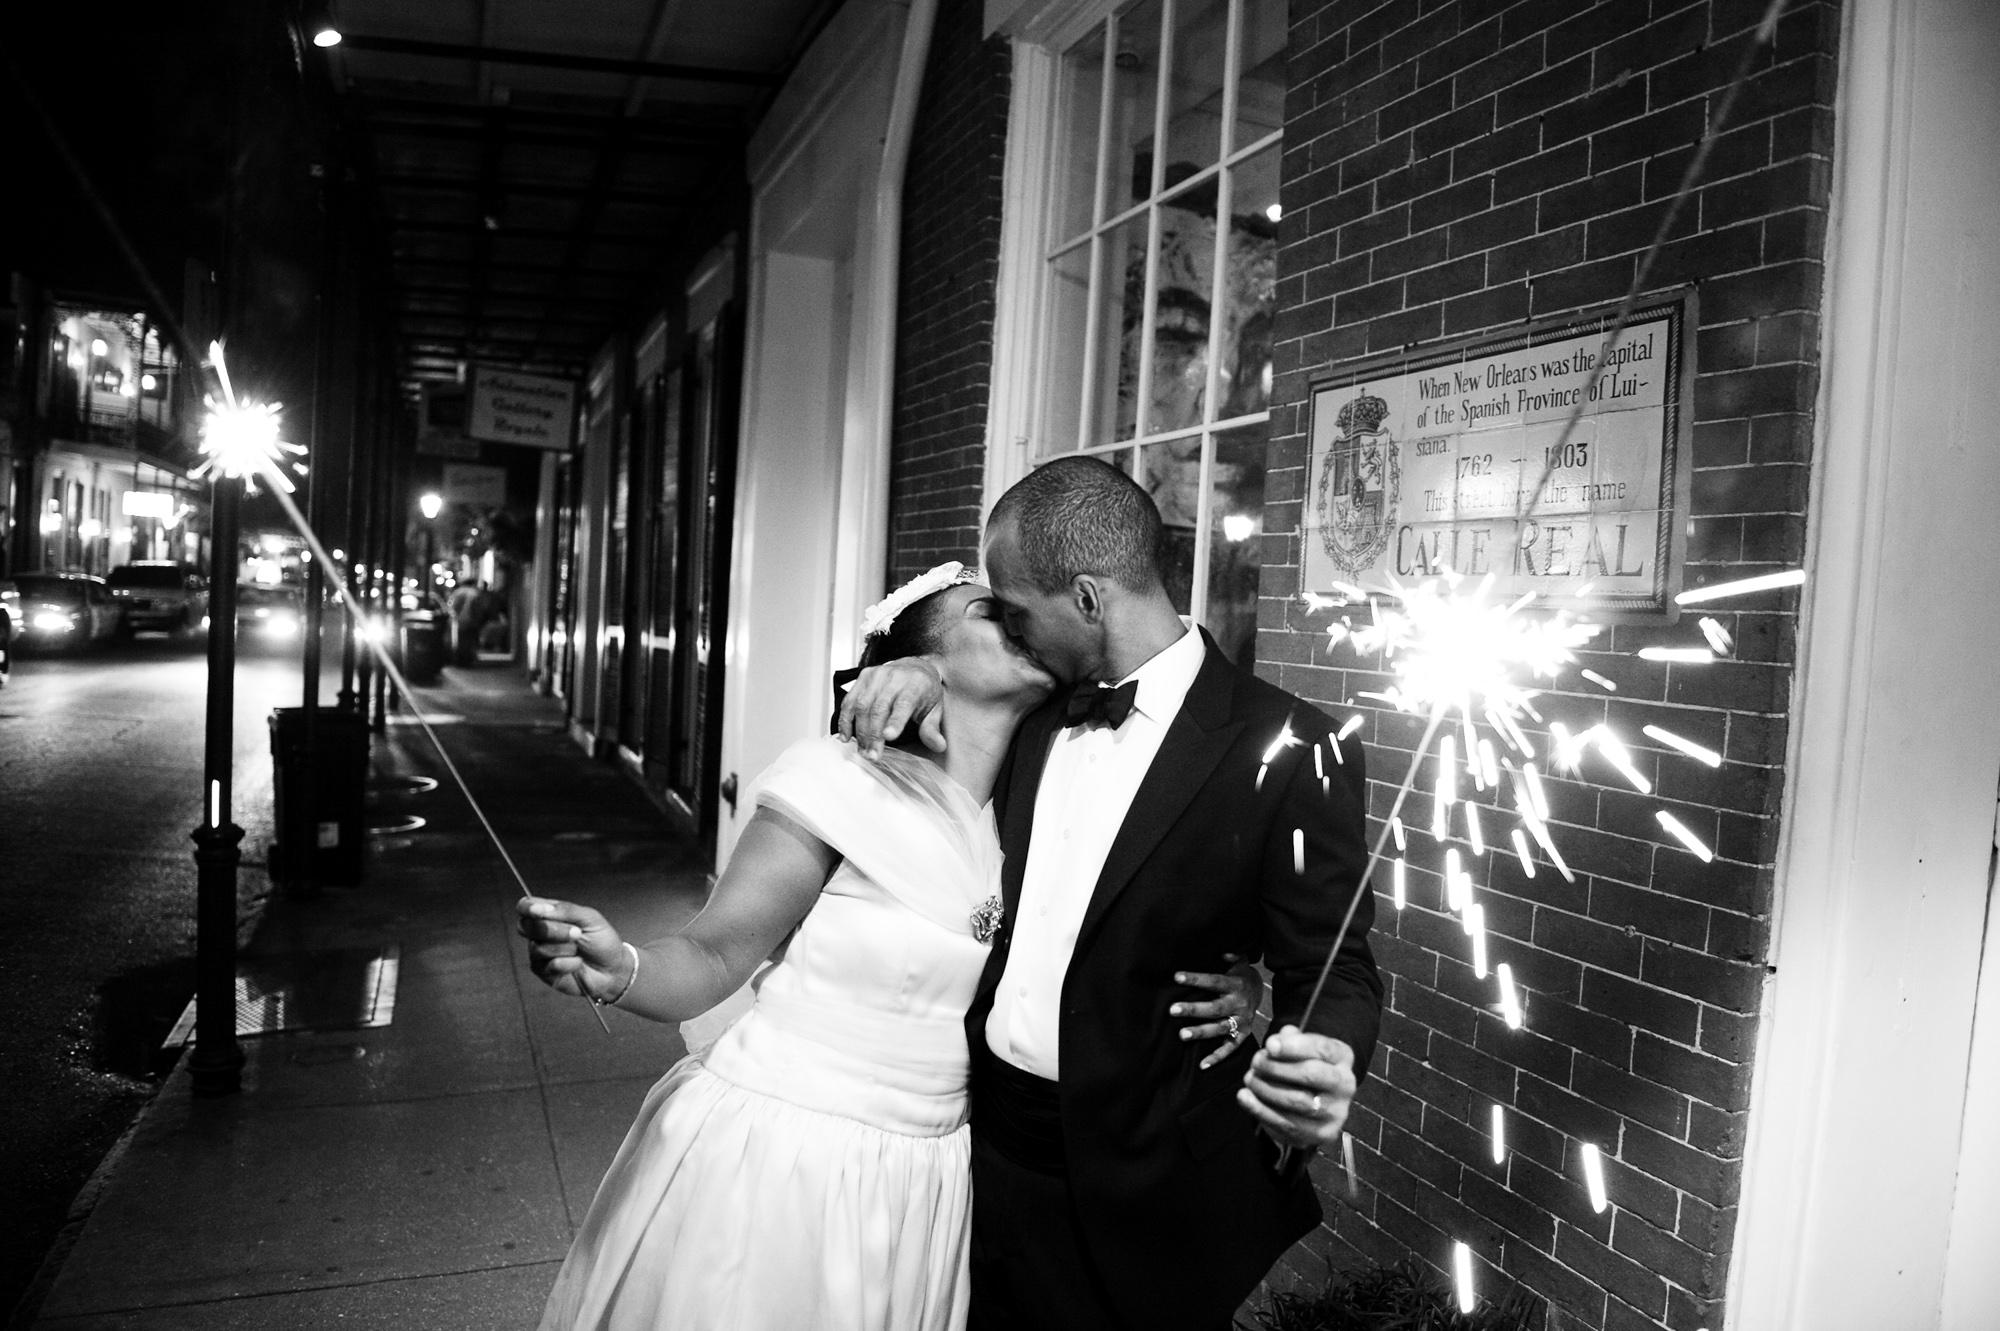 Scott-Myers-Photography-WeddingScott-Myers-Photography-Wedding3_Reception_SAM3357-2.jpg